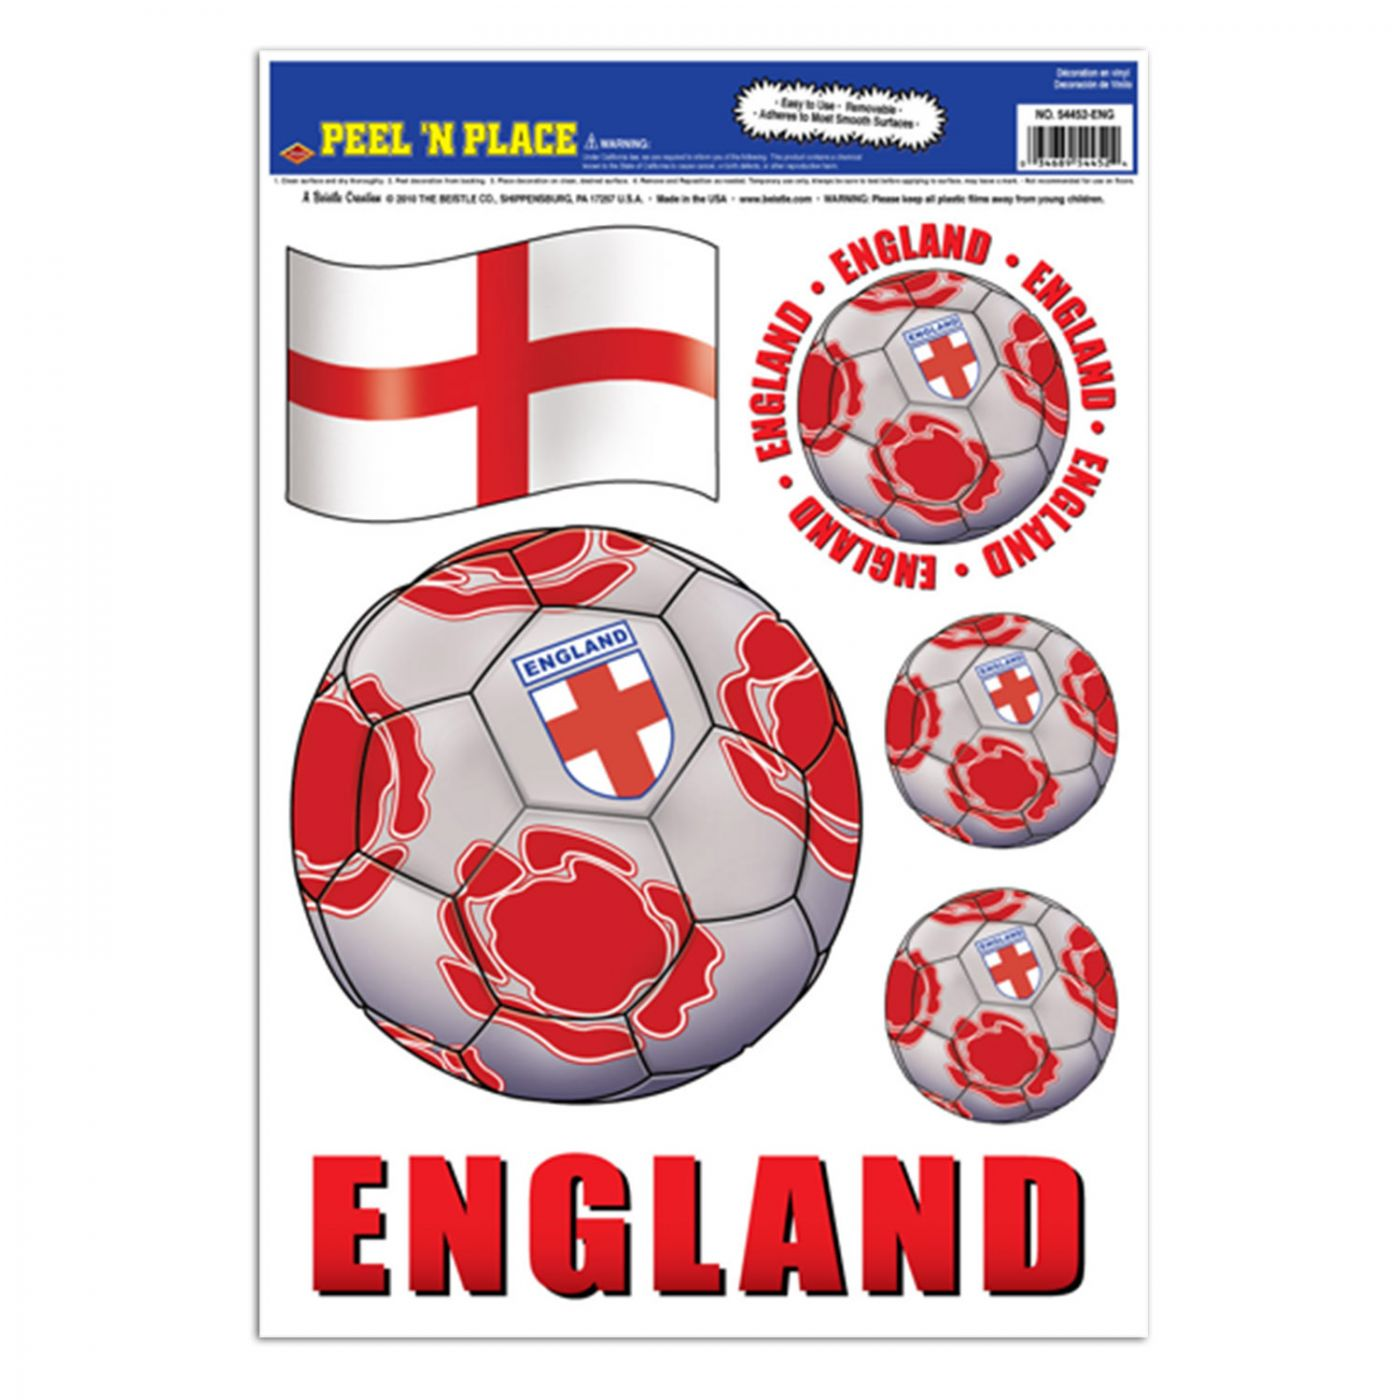 Peel 'N Place - England image